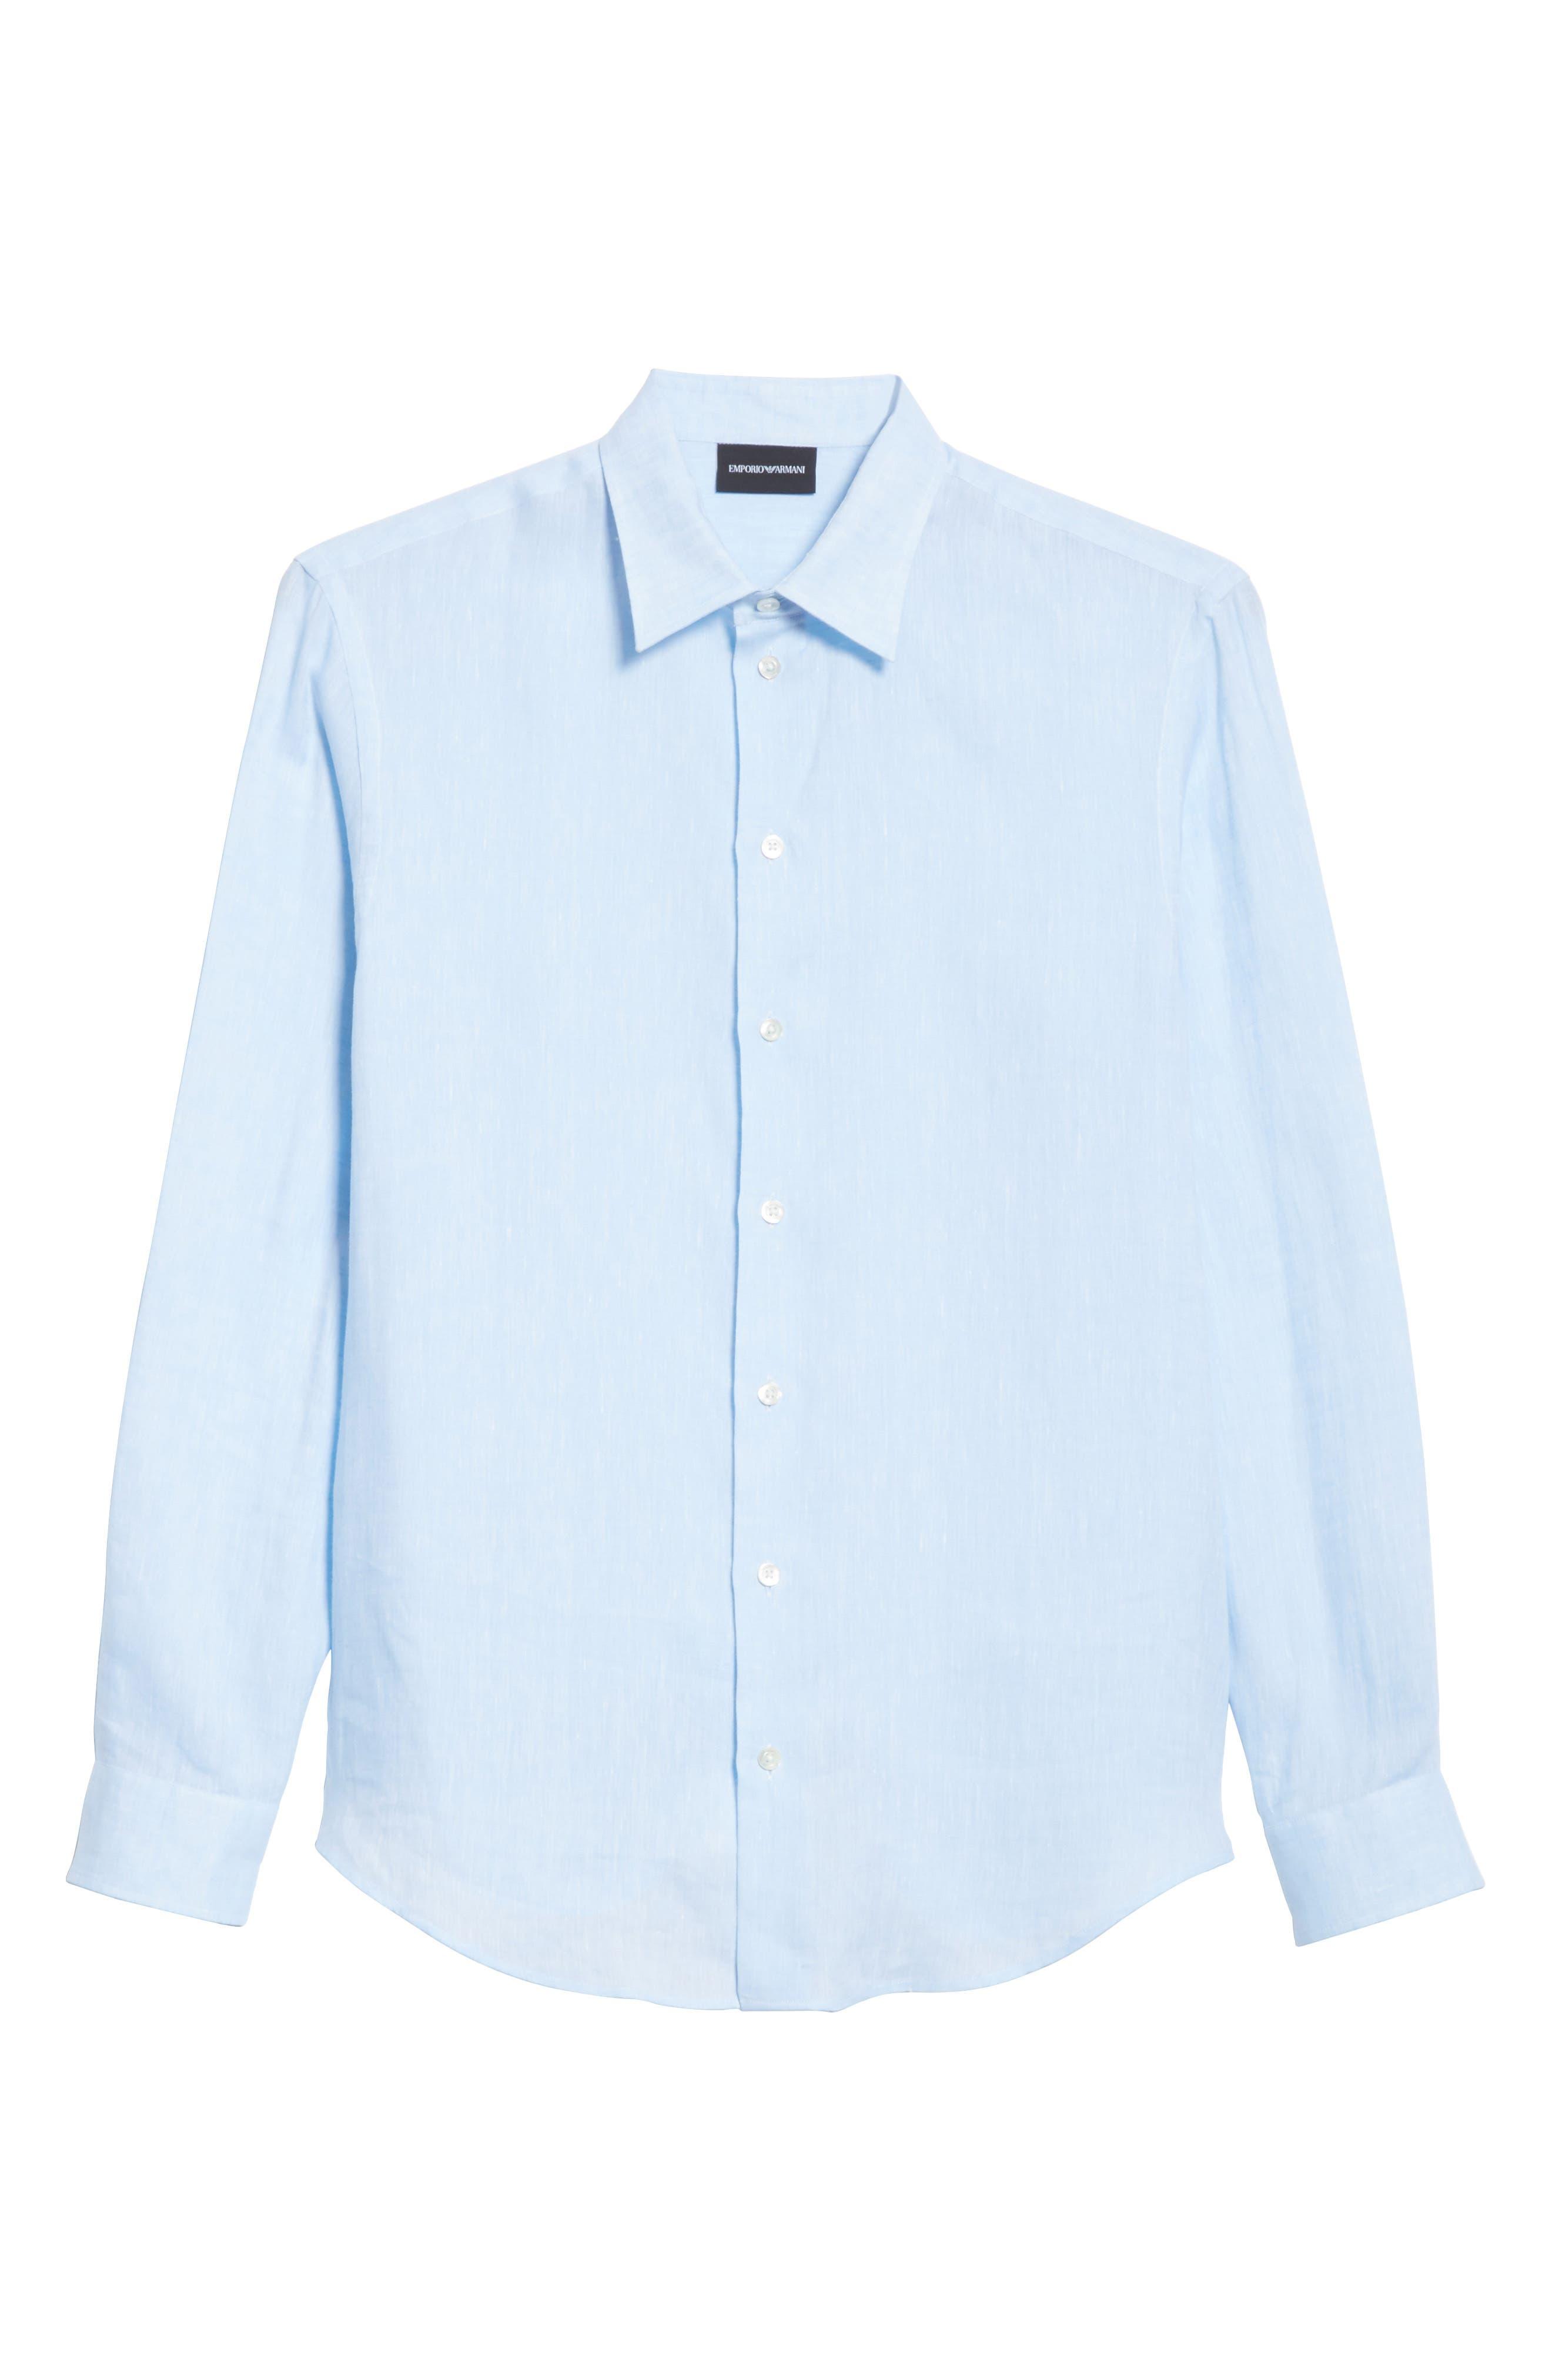 Regular Fit Linen Dress Shirt,                             Alternate thumbnail 12, color,